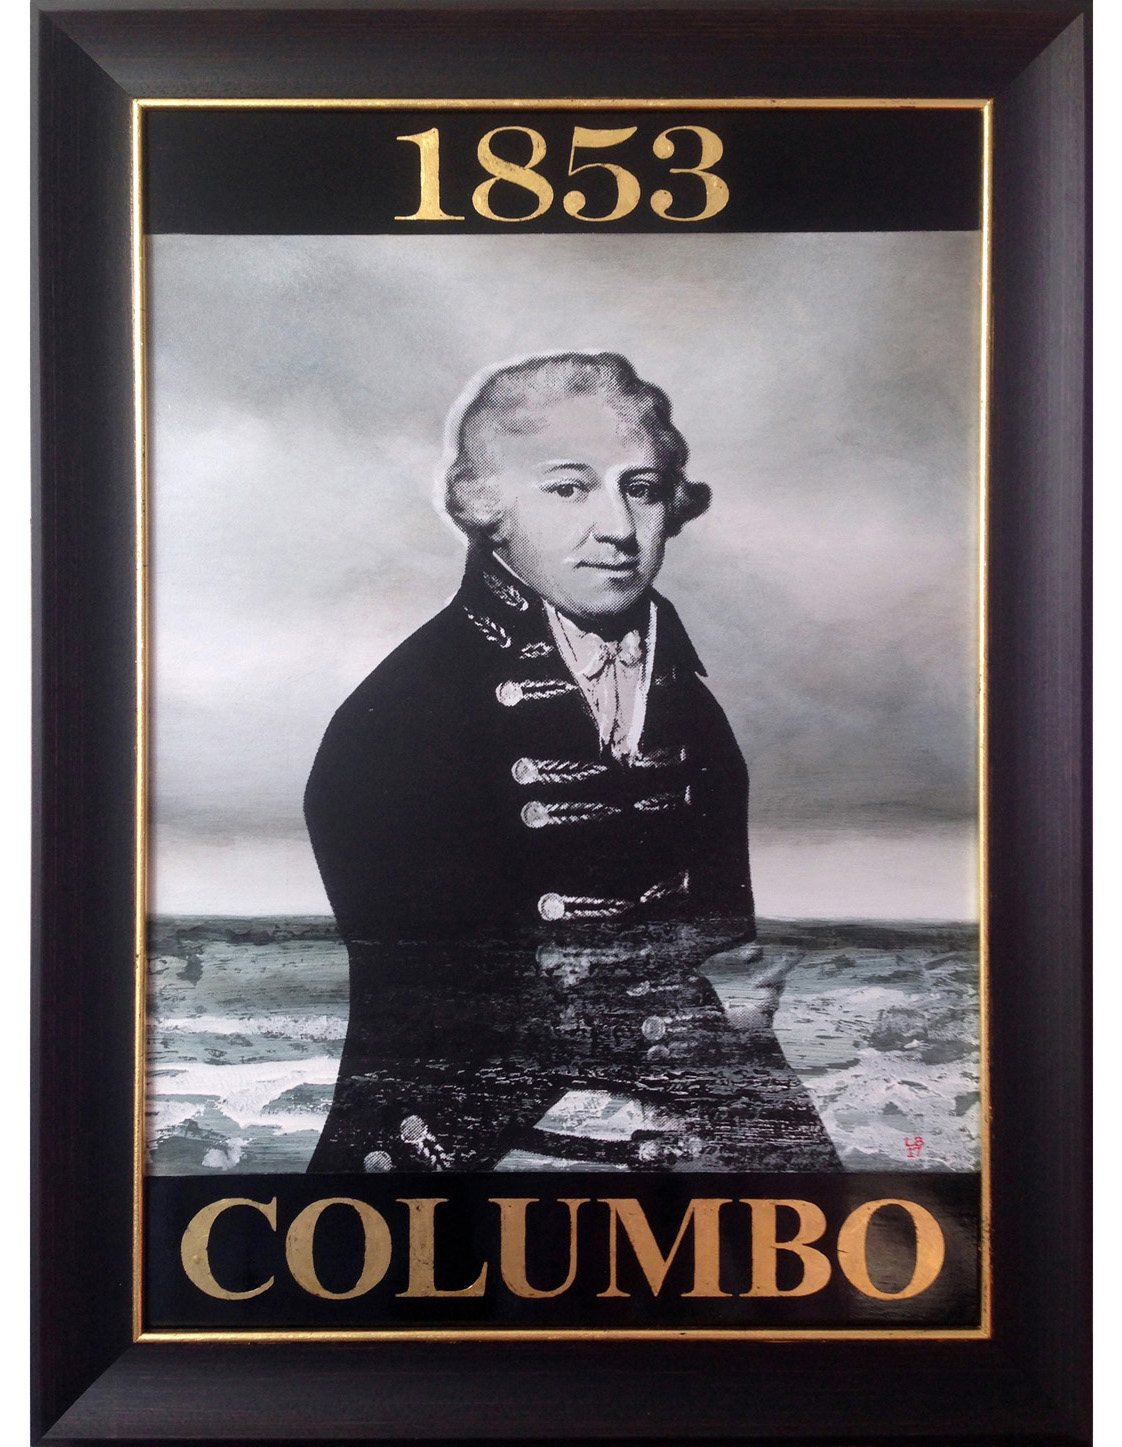 w Columbo 1853.jpg